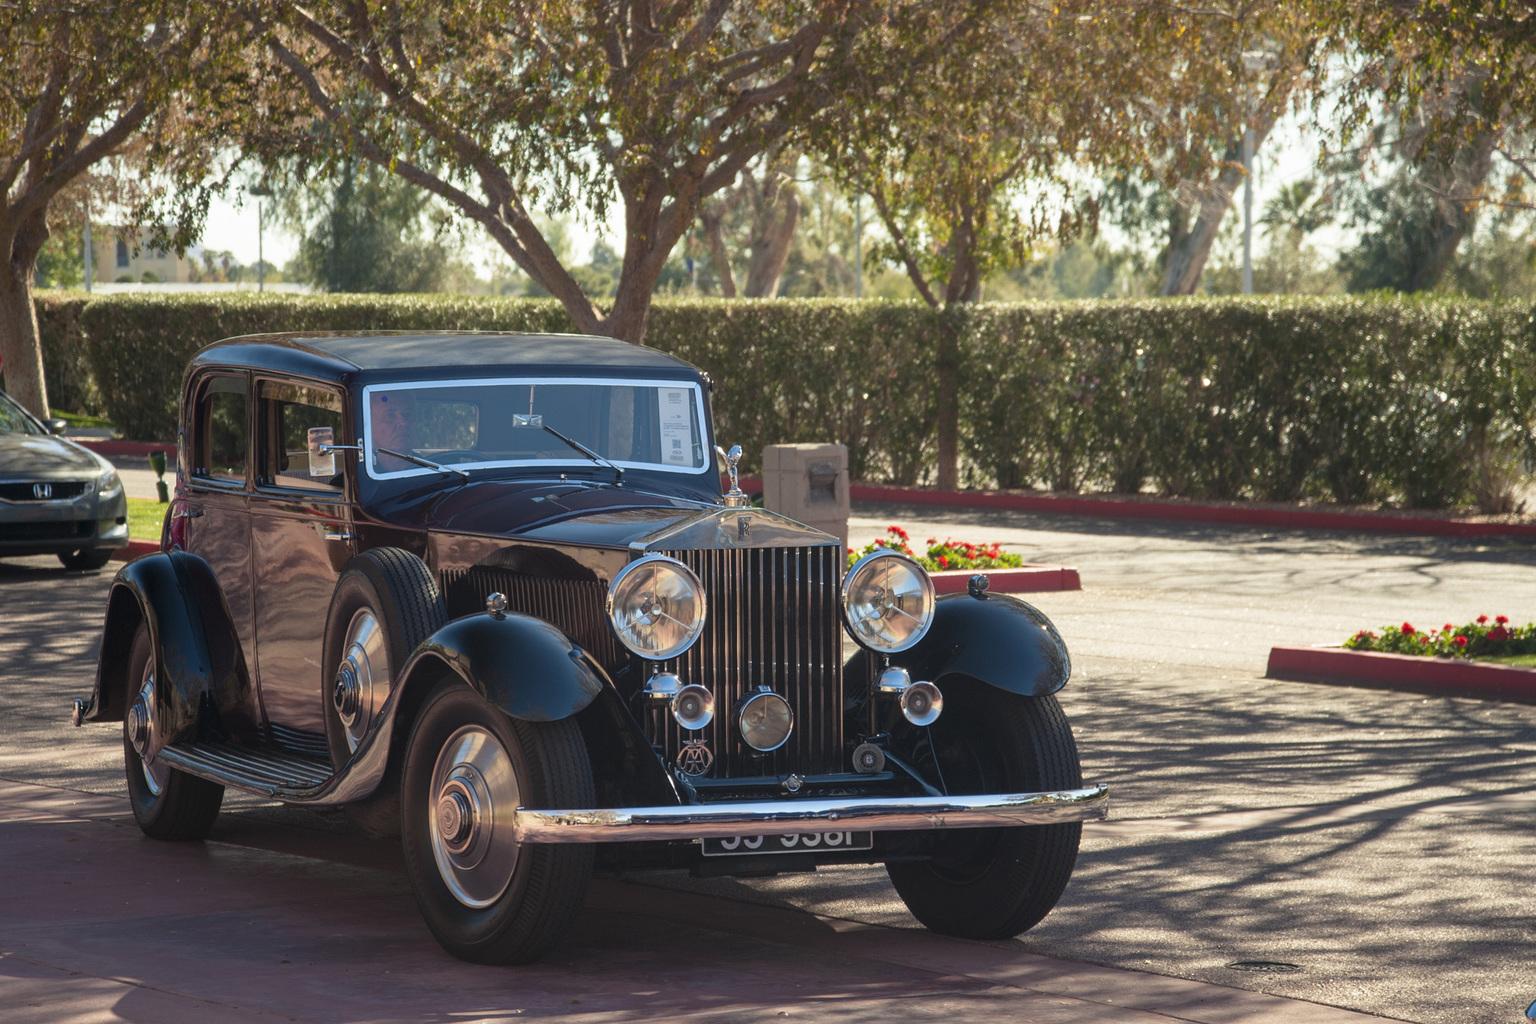 High Resolution Wallpaper | 1929 Rolls-royce Phantom Ii 1536x1024 px